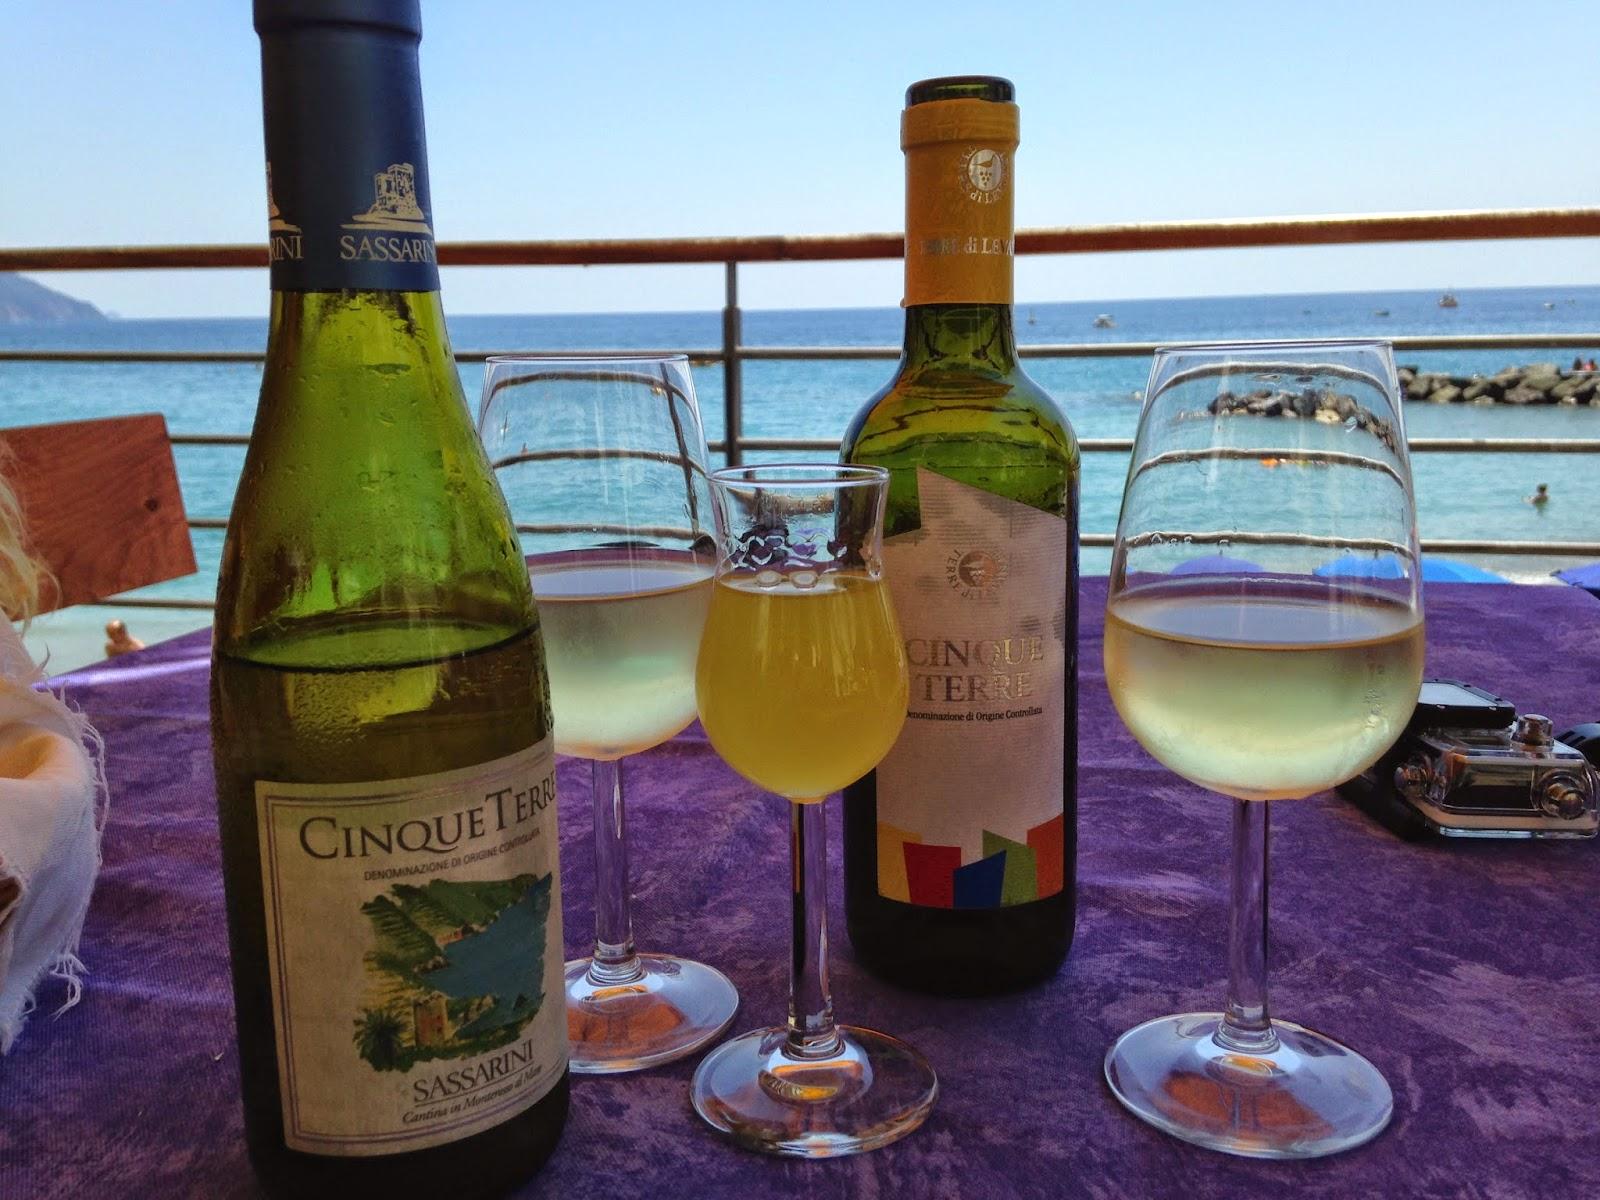 bottles of Cinque Terre wine